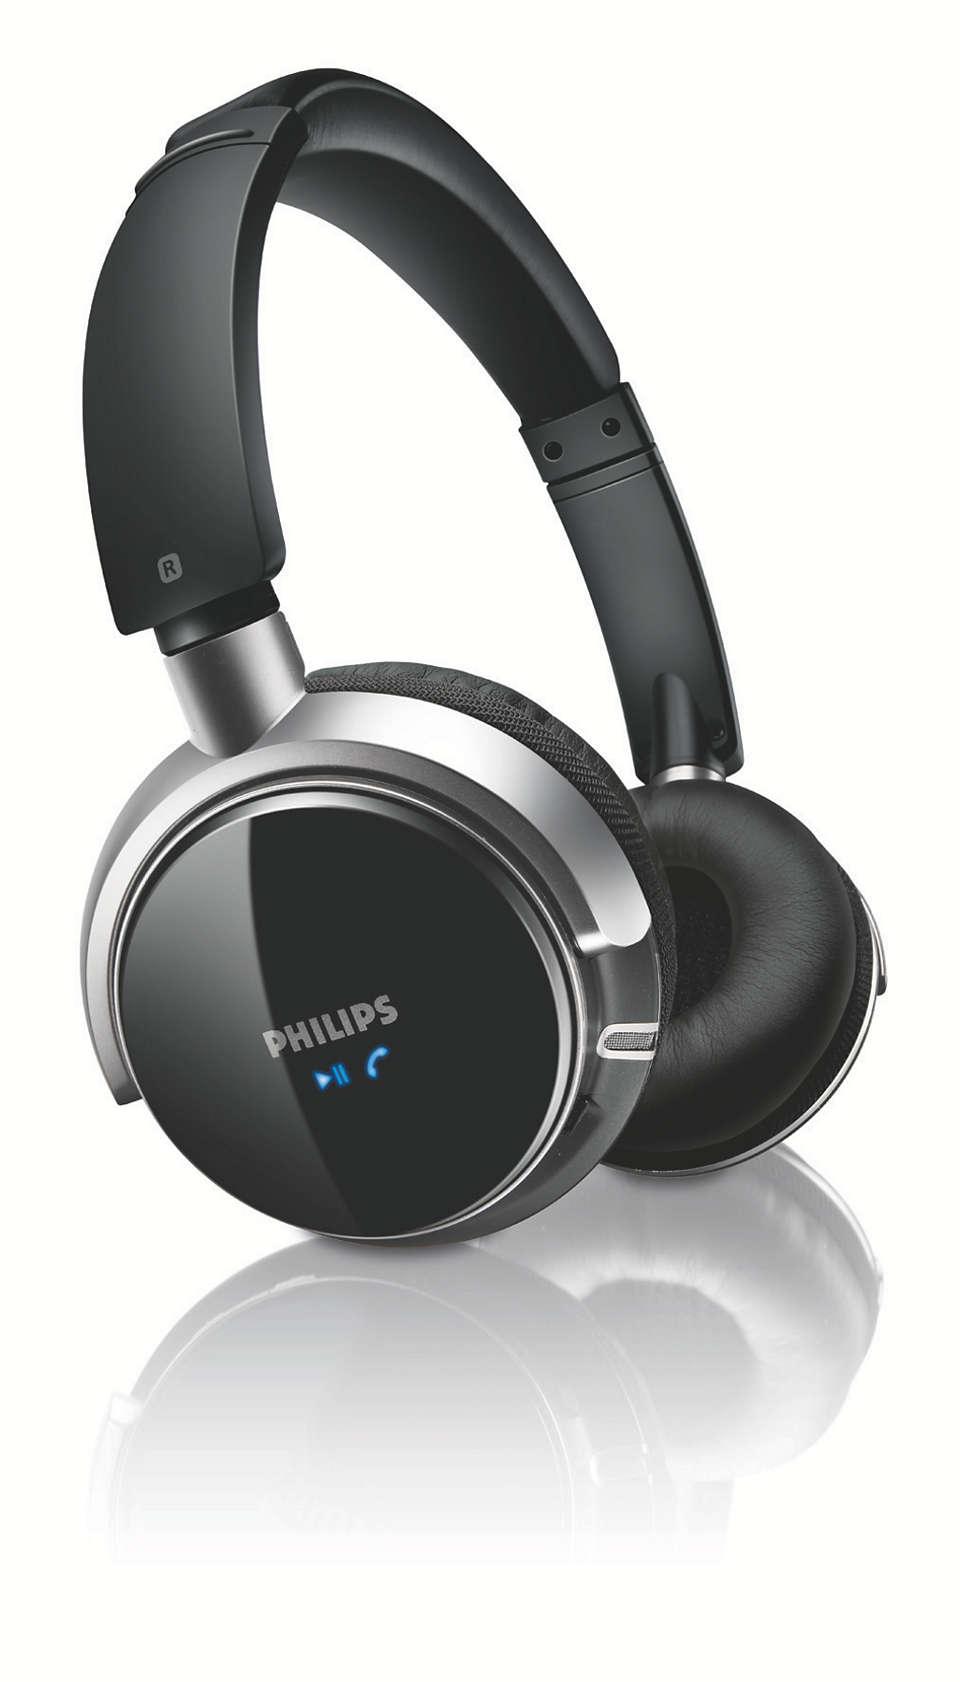 Pure wireless sound